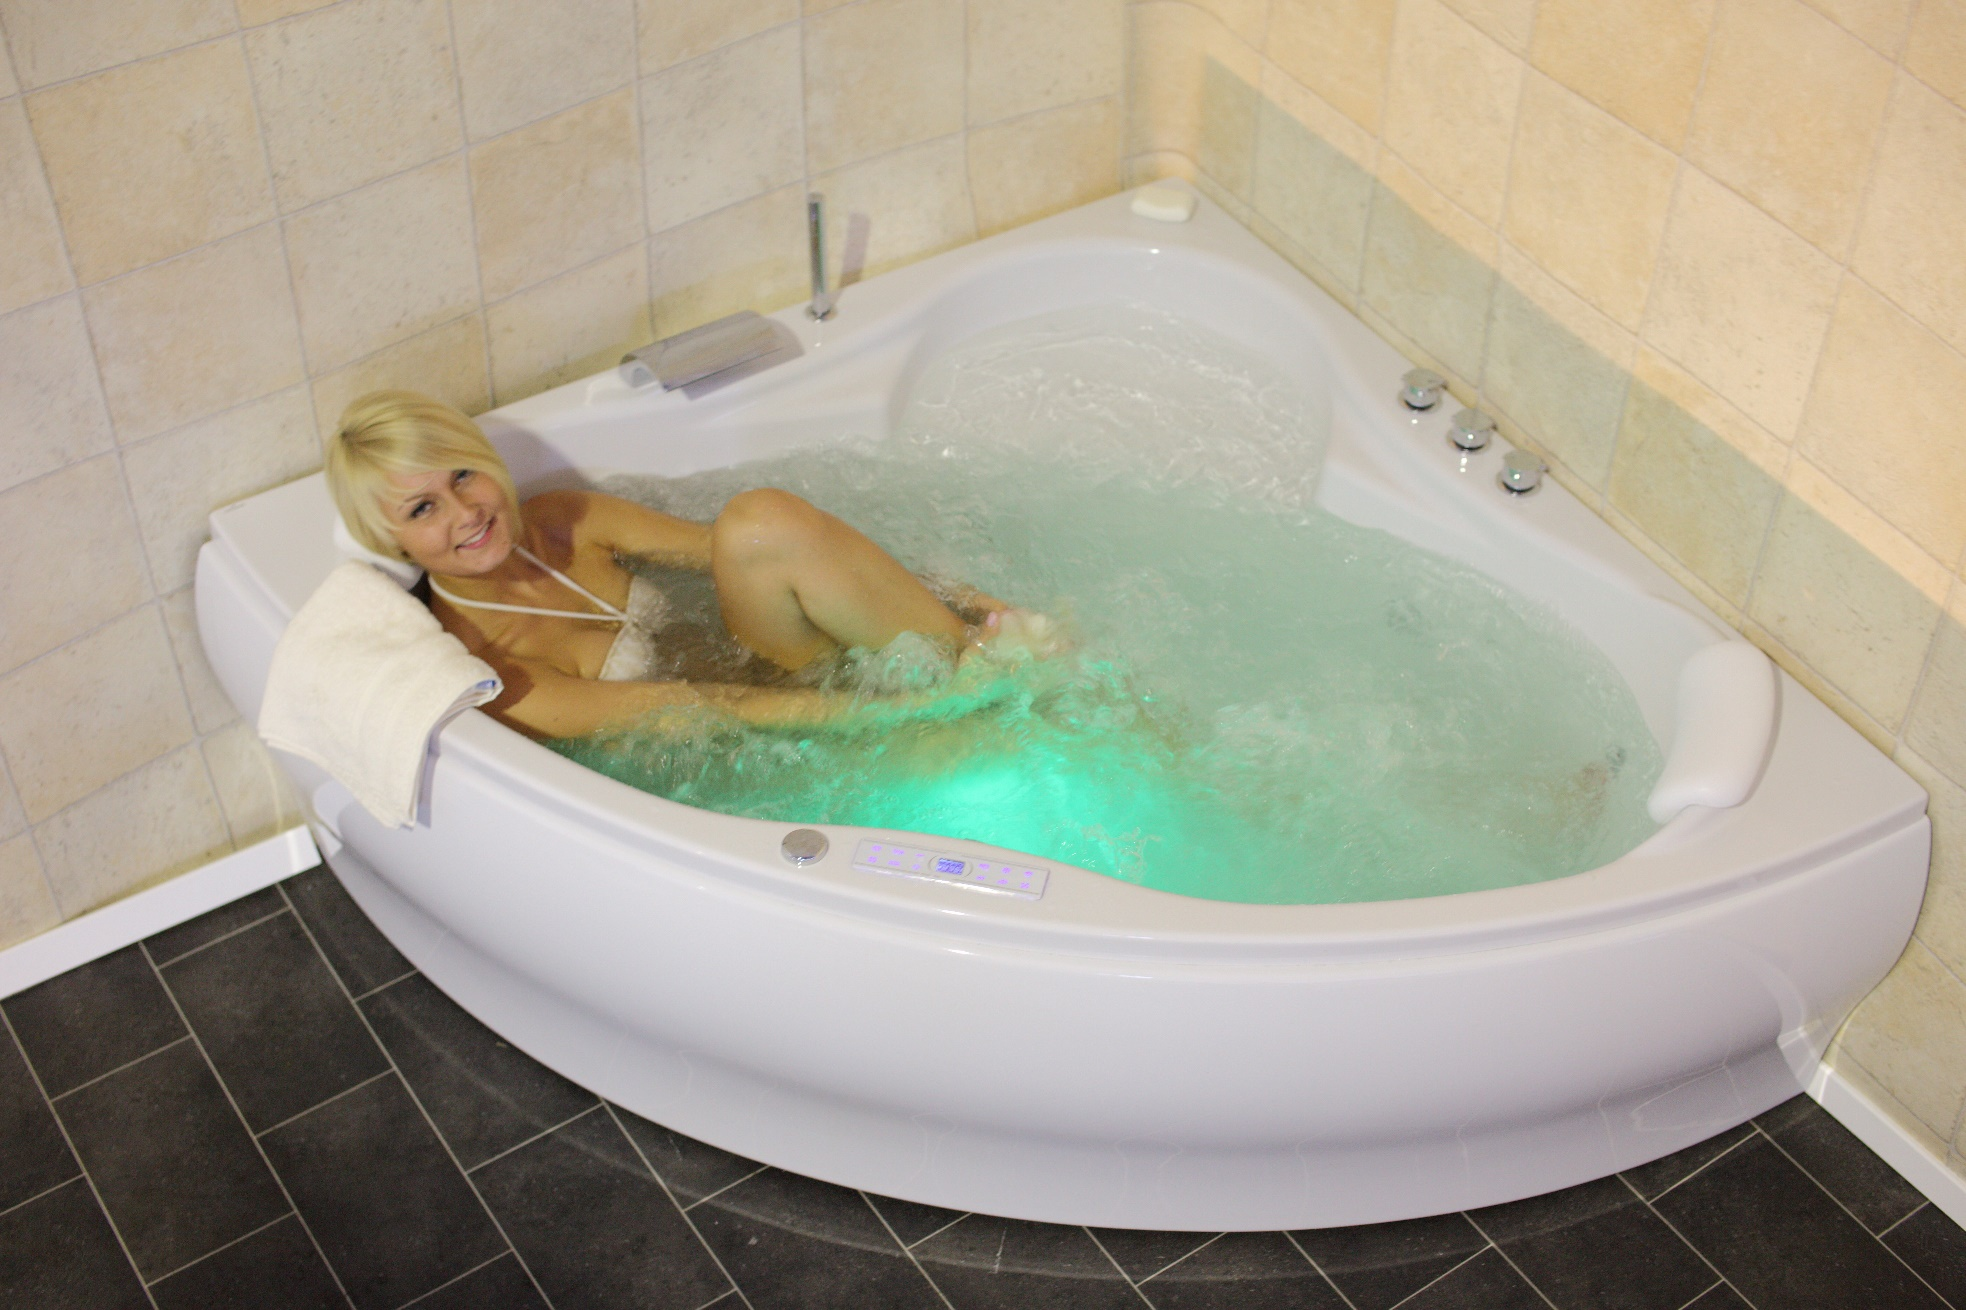 jacuzzi tub 24 jets heating ozone led tv radio jacuzzi spa. Black Bedroom Furniture Sets. Home Design Ideas